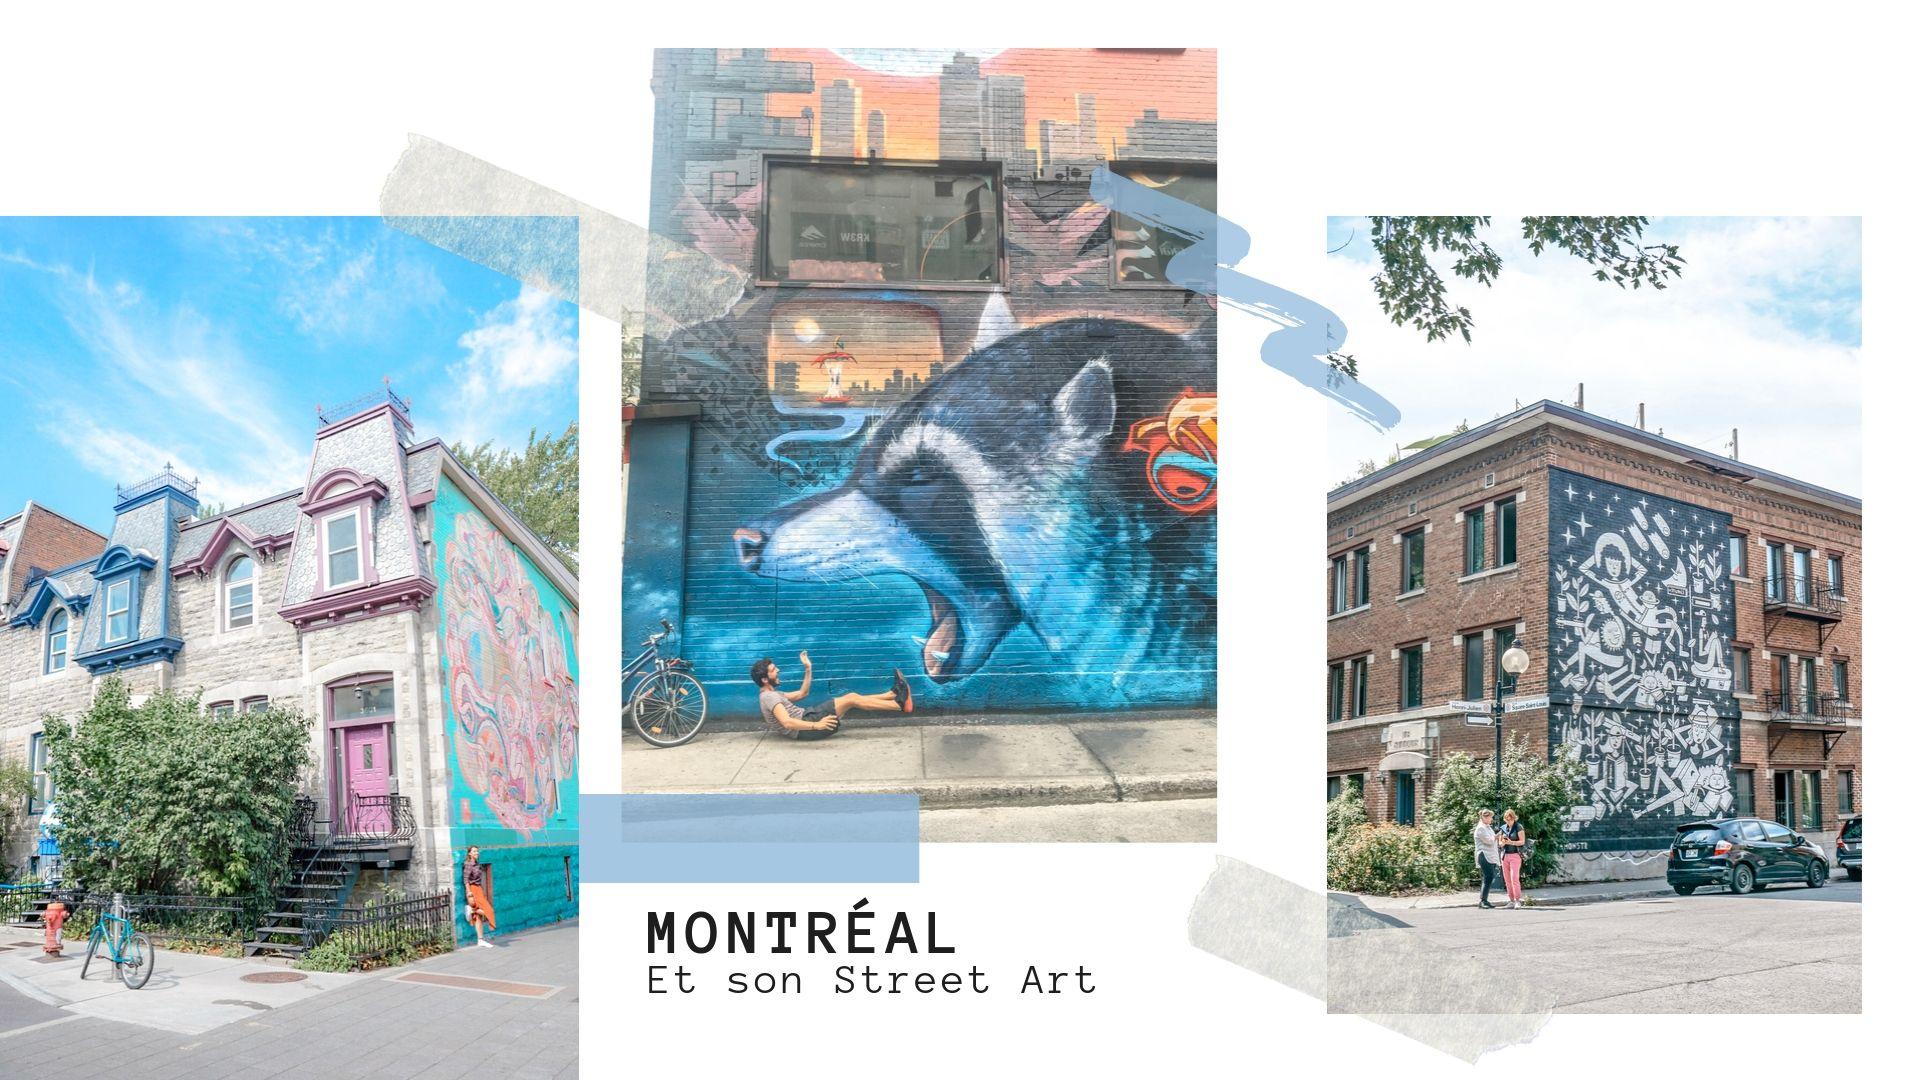 visiter montréal quebec street art canada blog